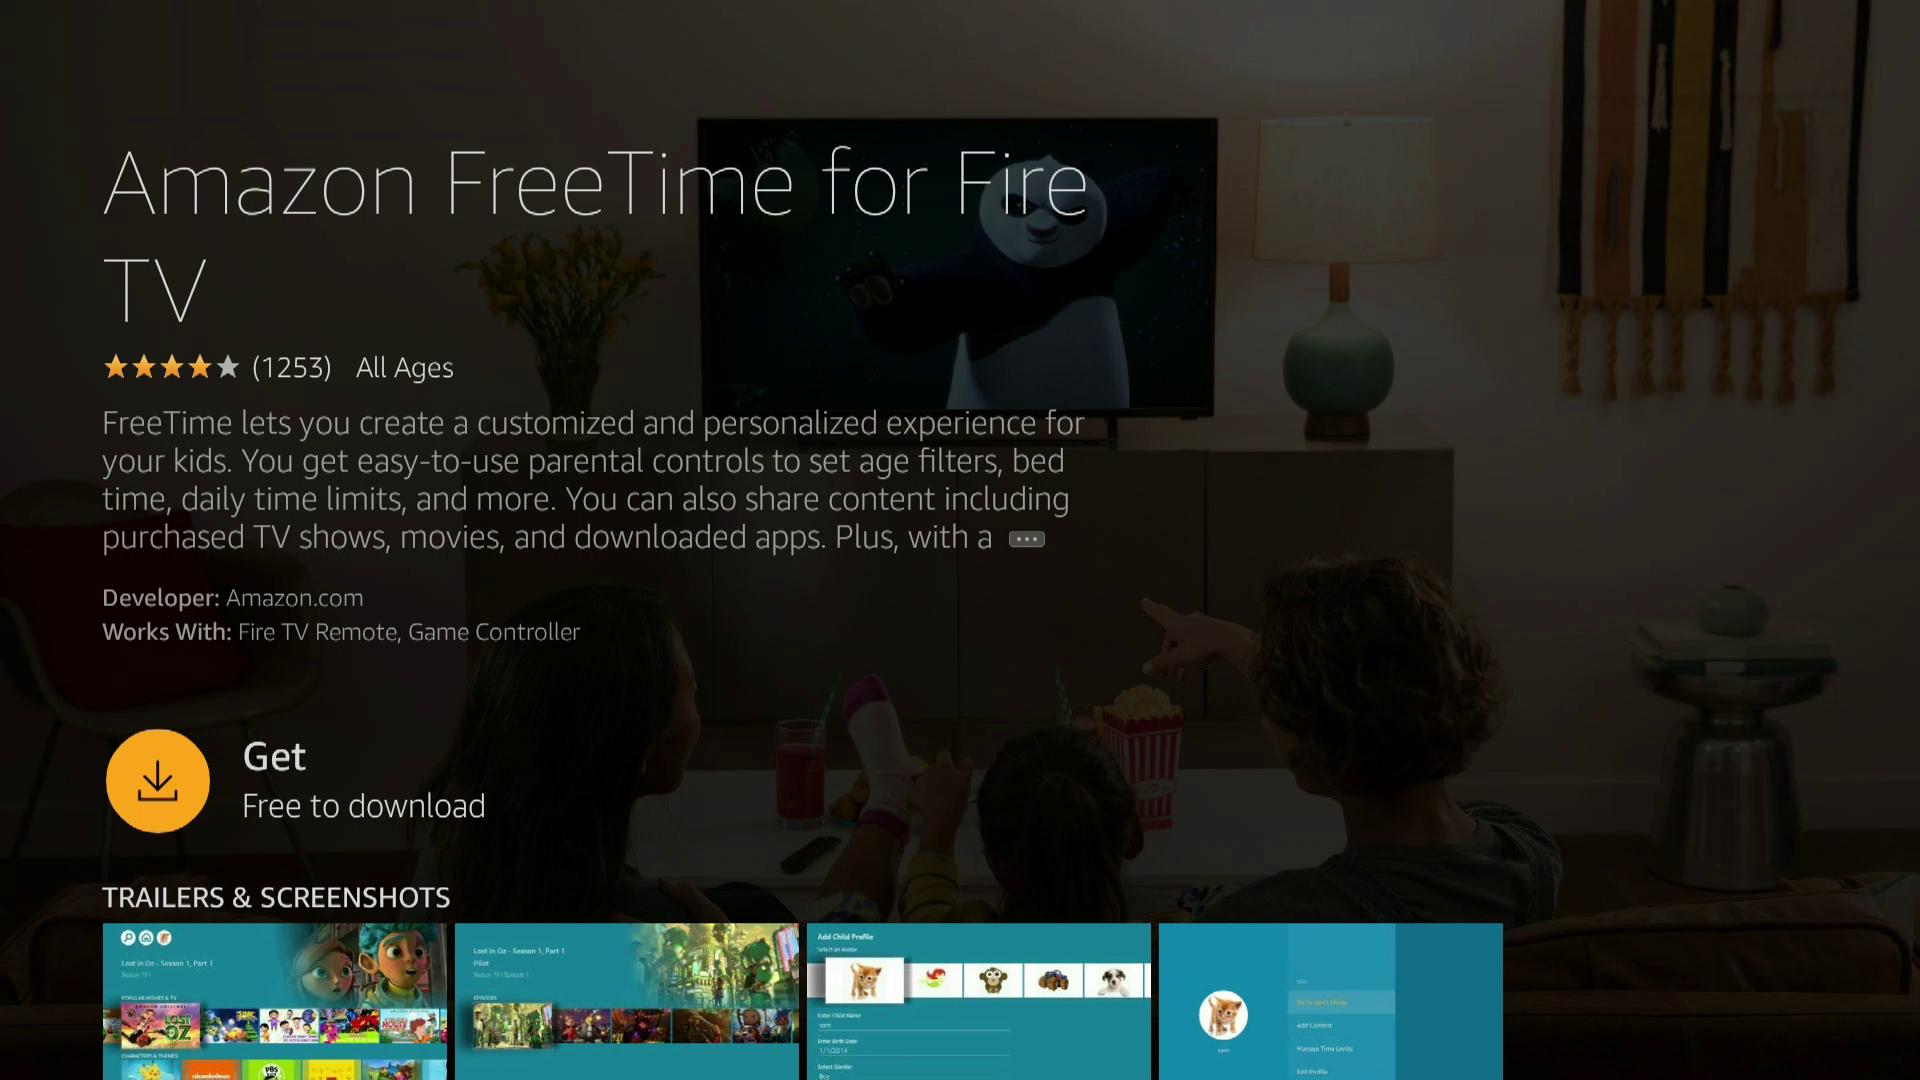 A screenshot of downloading FreeTime to a Firestick.